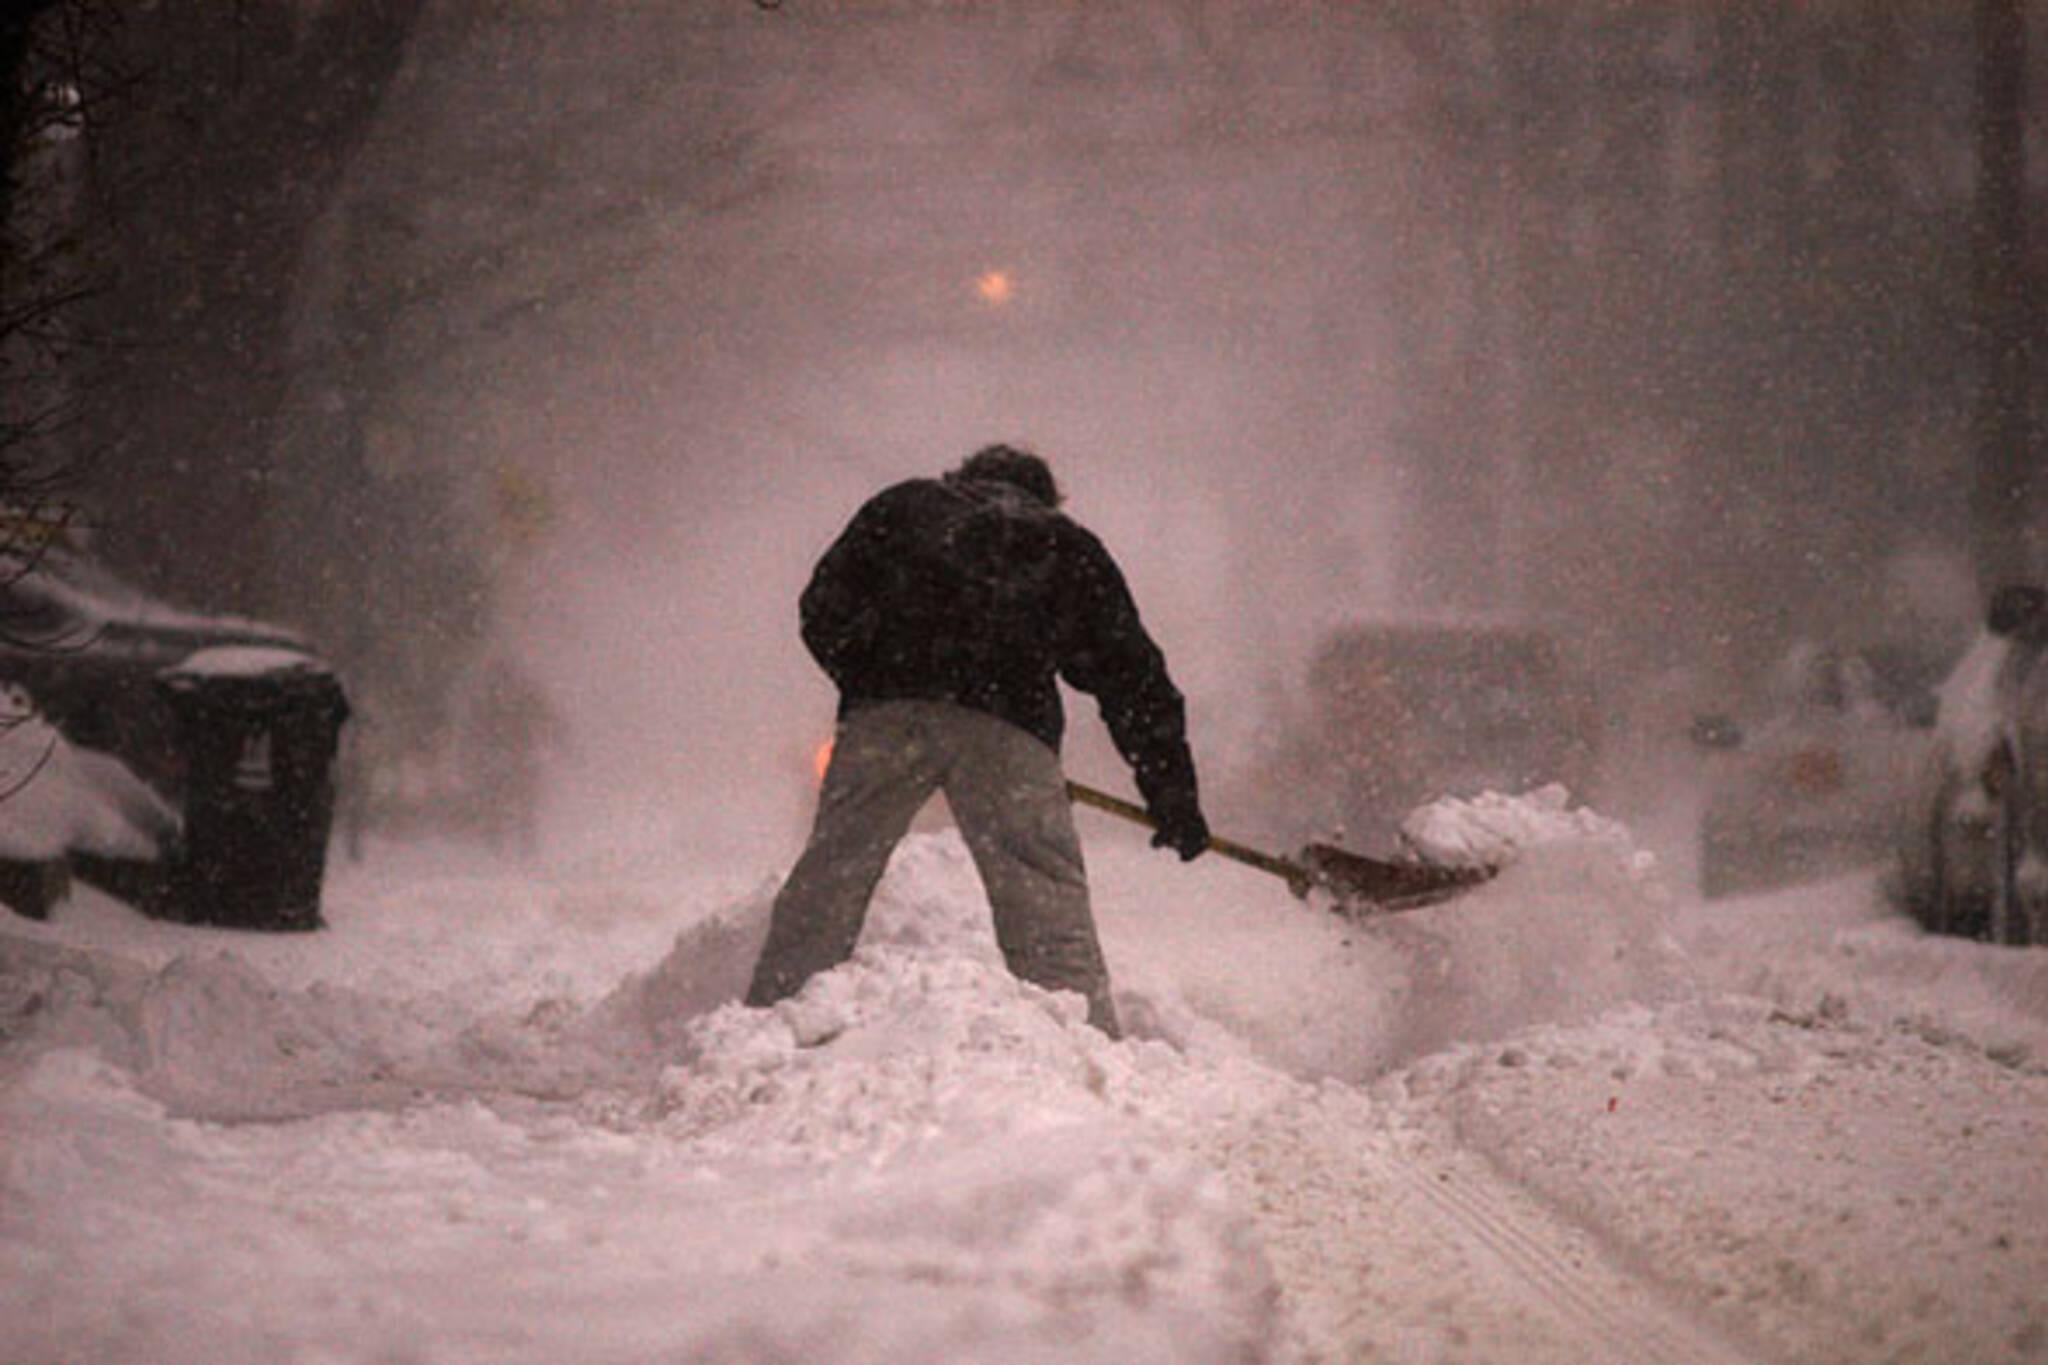 snowmageddon toronto 2008